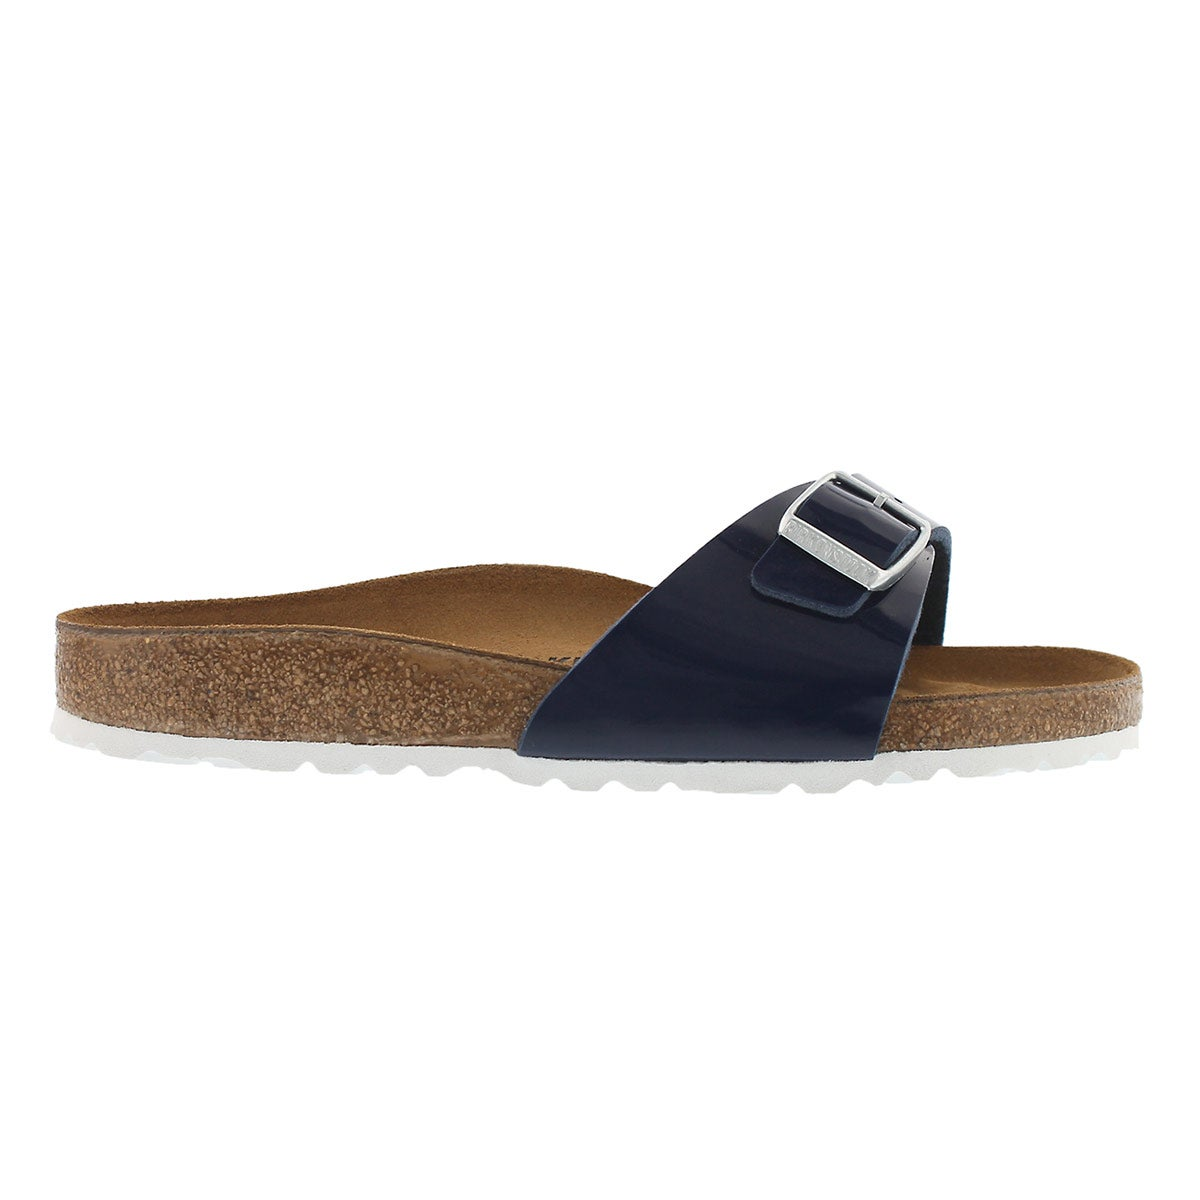 Lds Madrid blue dress BF 1 strap sandal